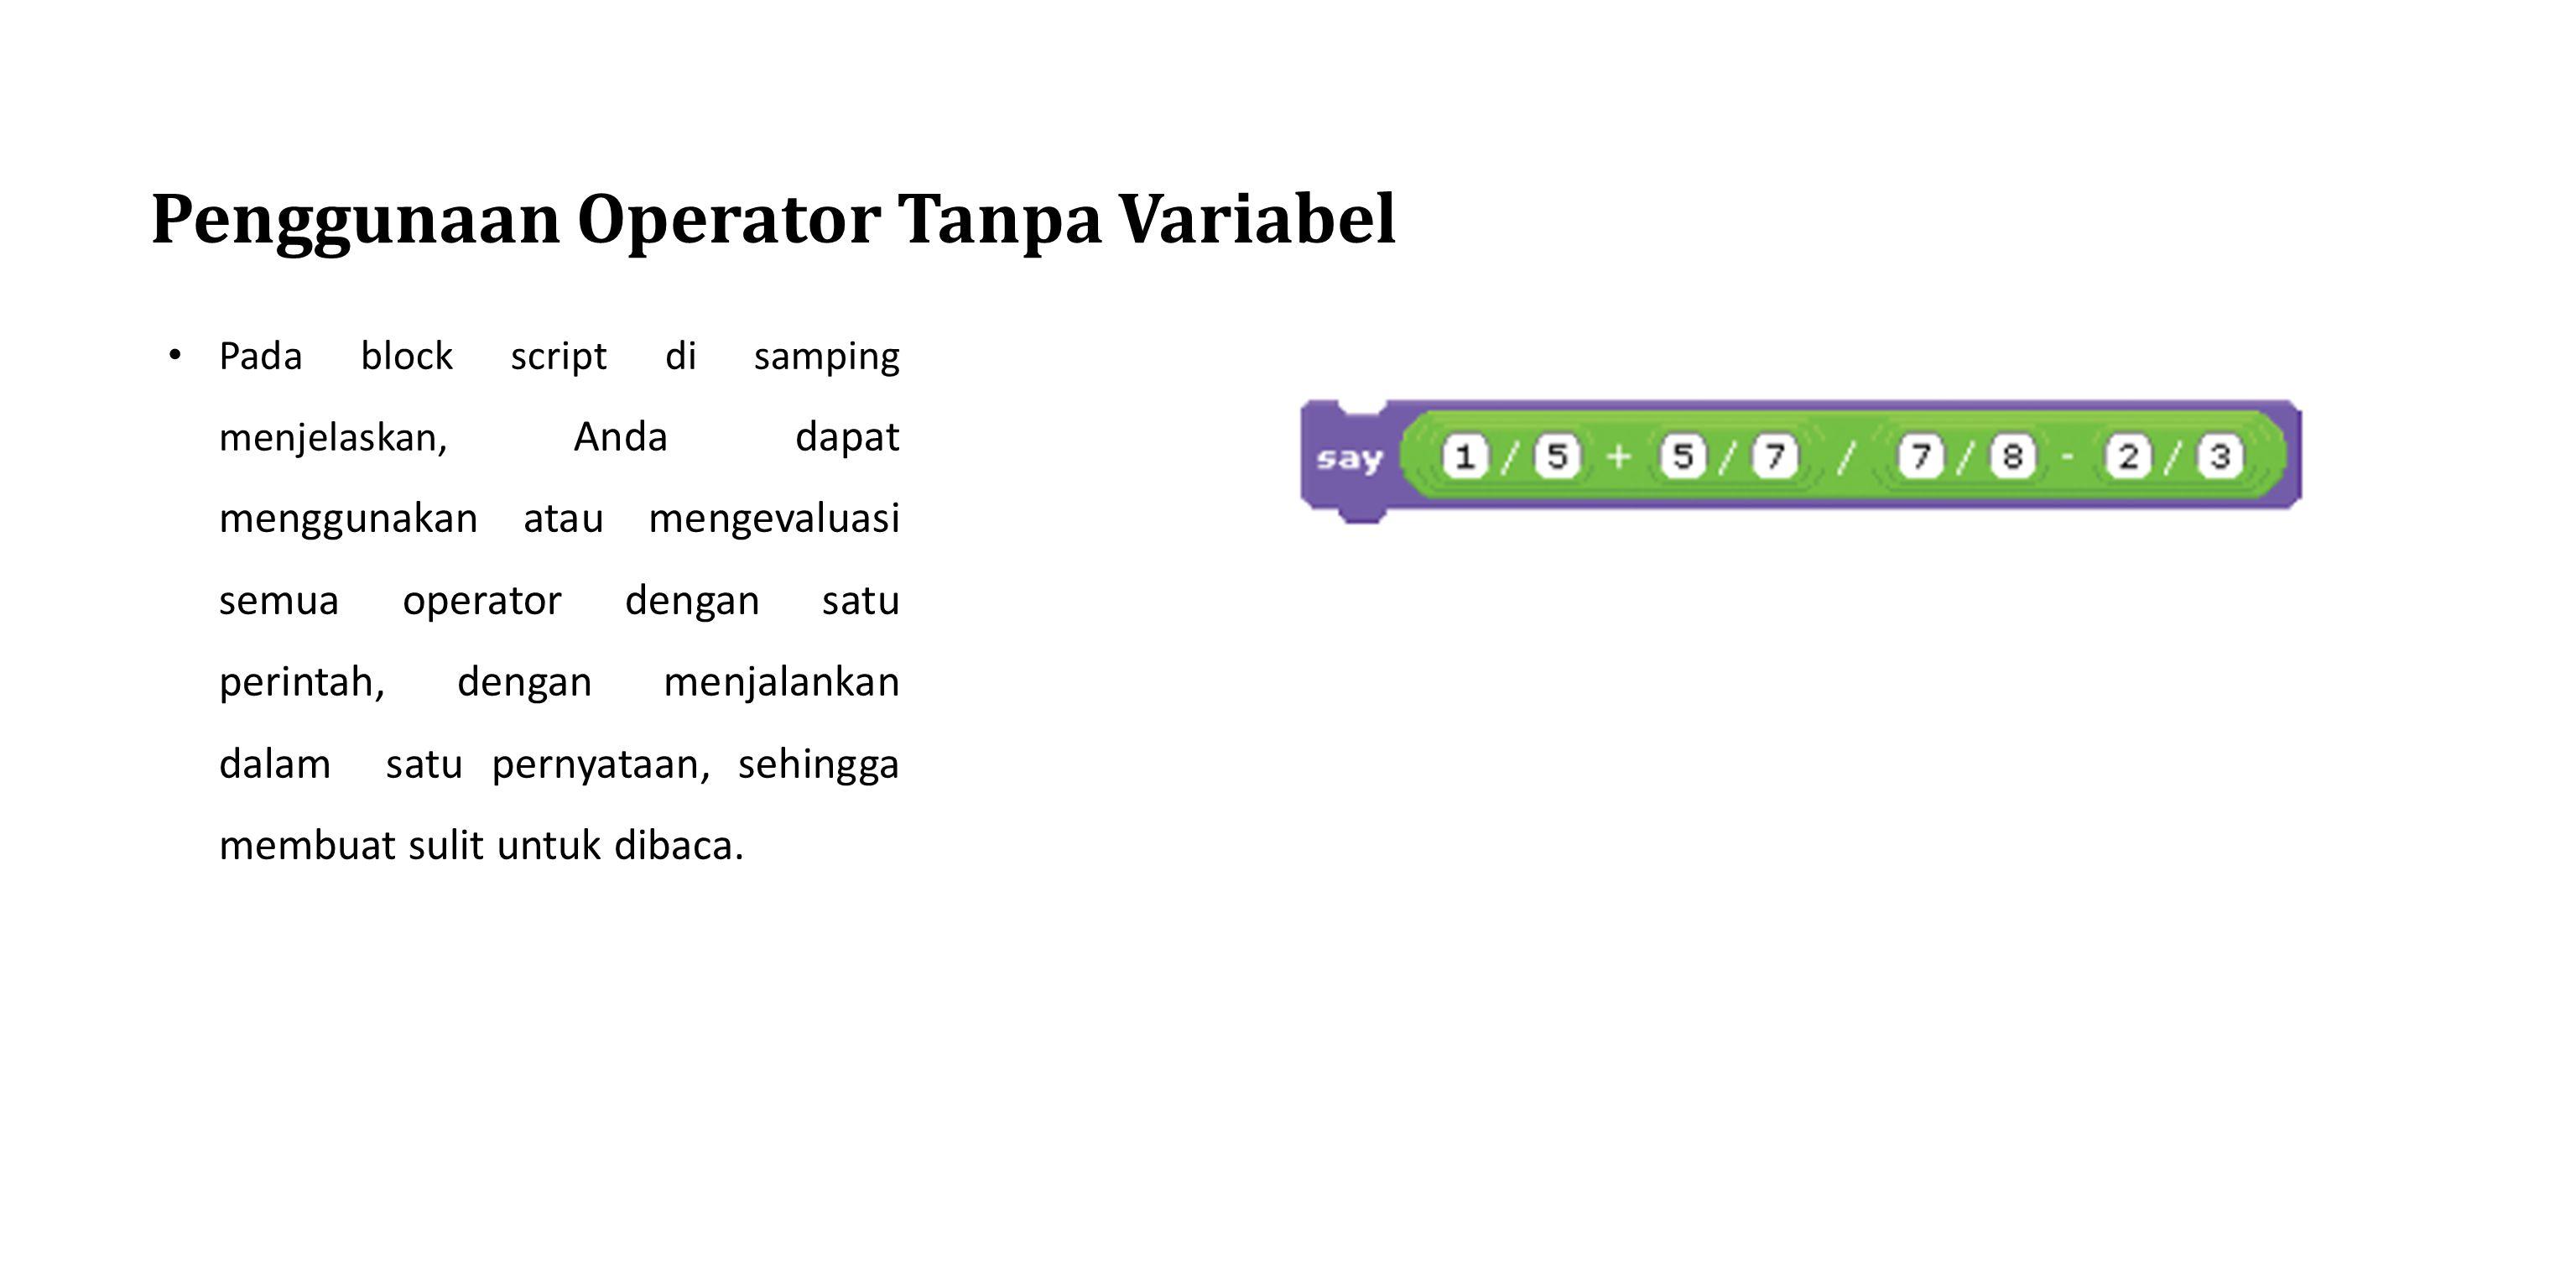 Penggunaan Operator Tanpa Variabel Pada block script di samping menjelaskan, Anda dapat menggunakan atau mengevaluasi semua operator dengan satu perin